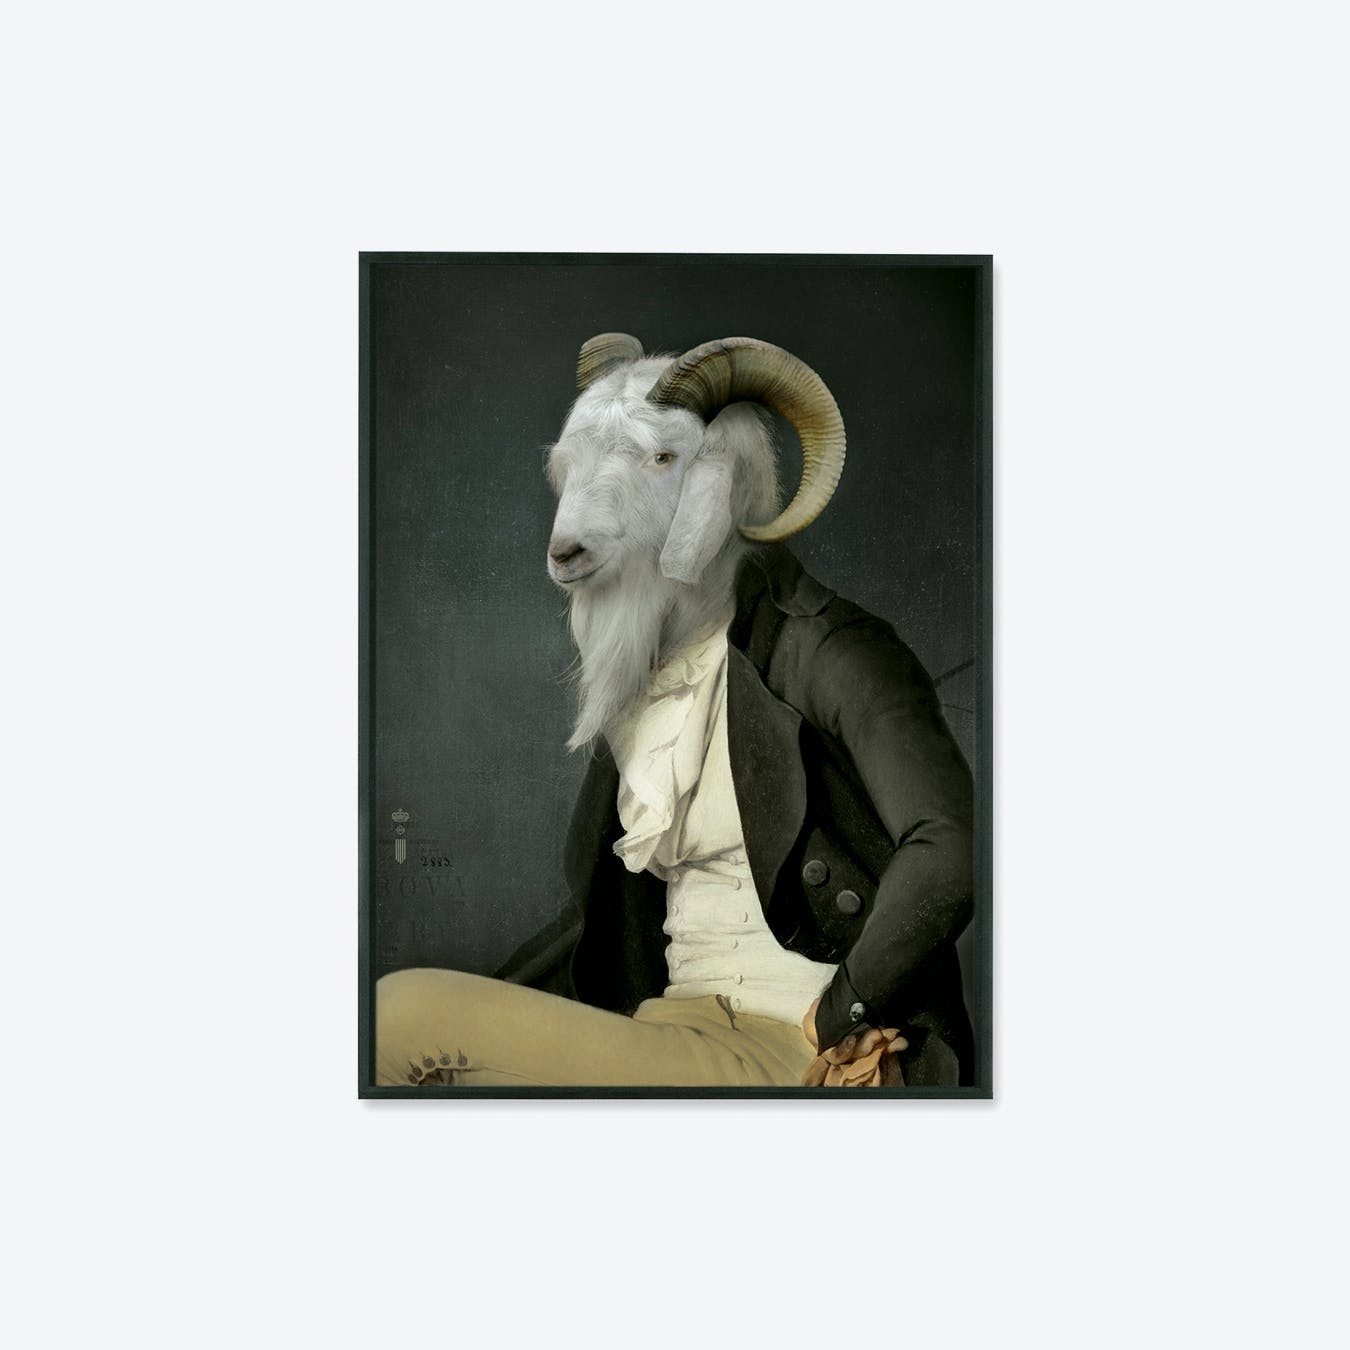 RODOLPHE Collector's Portrait